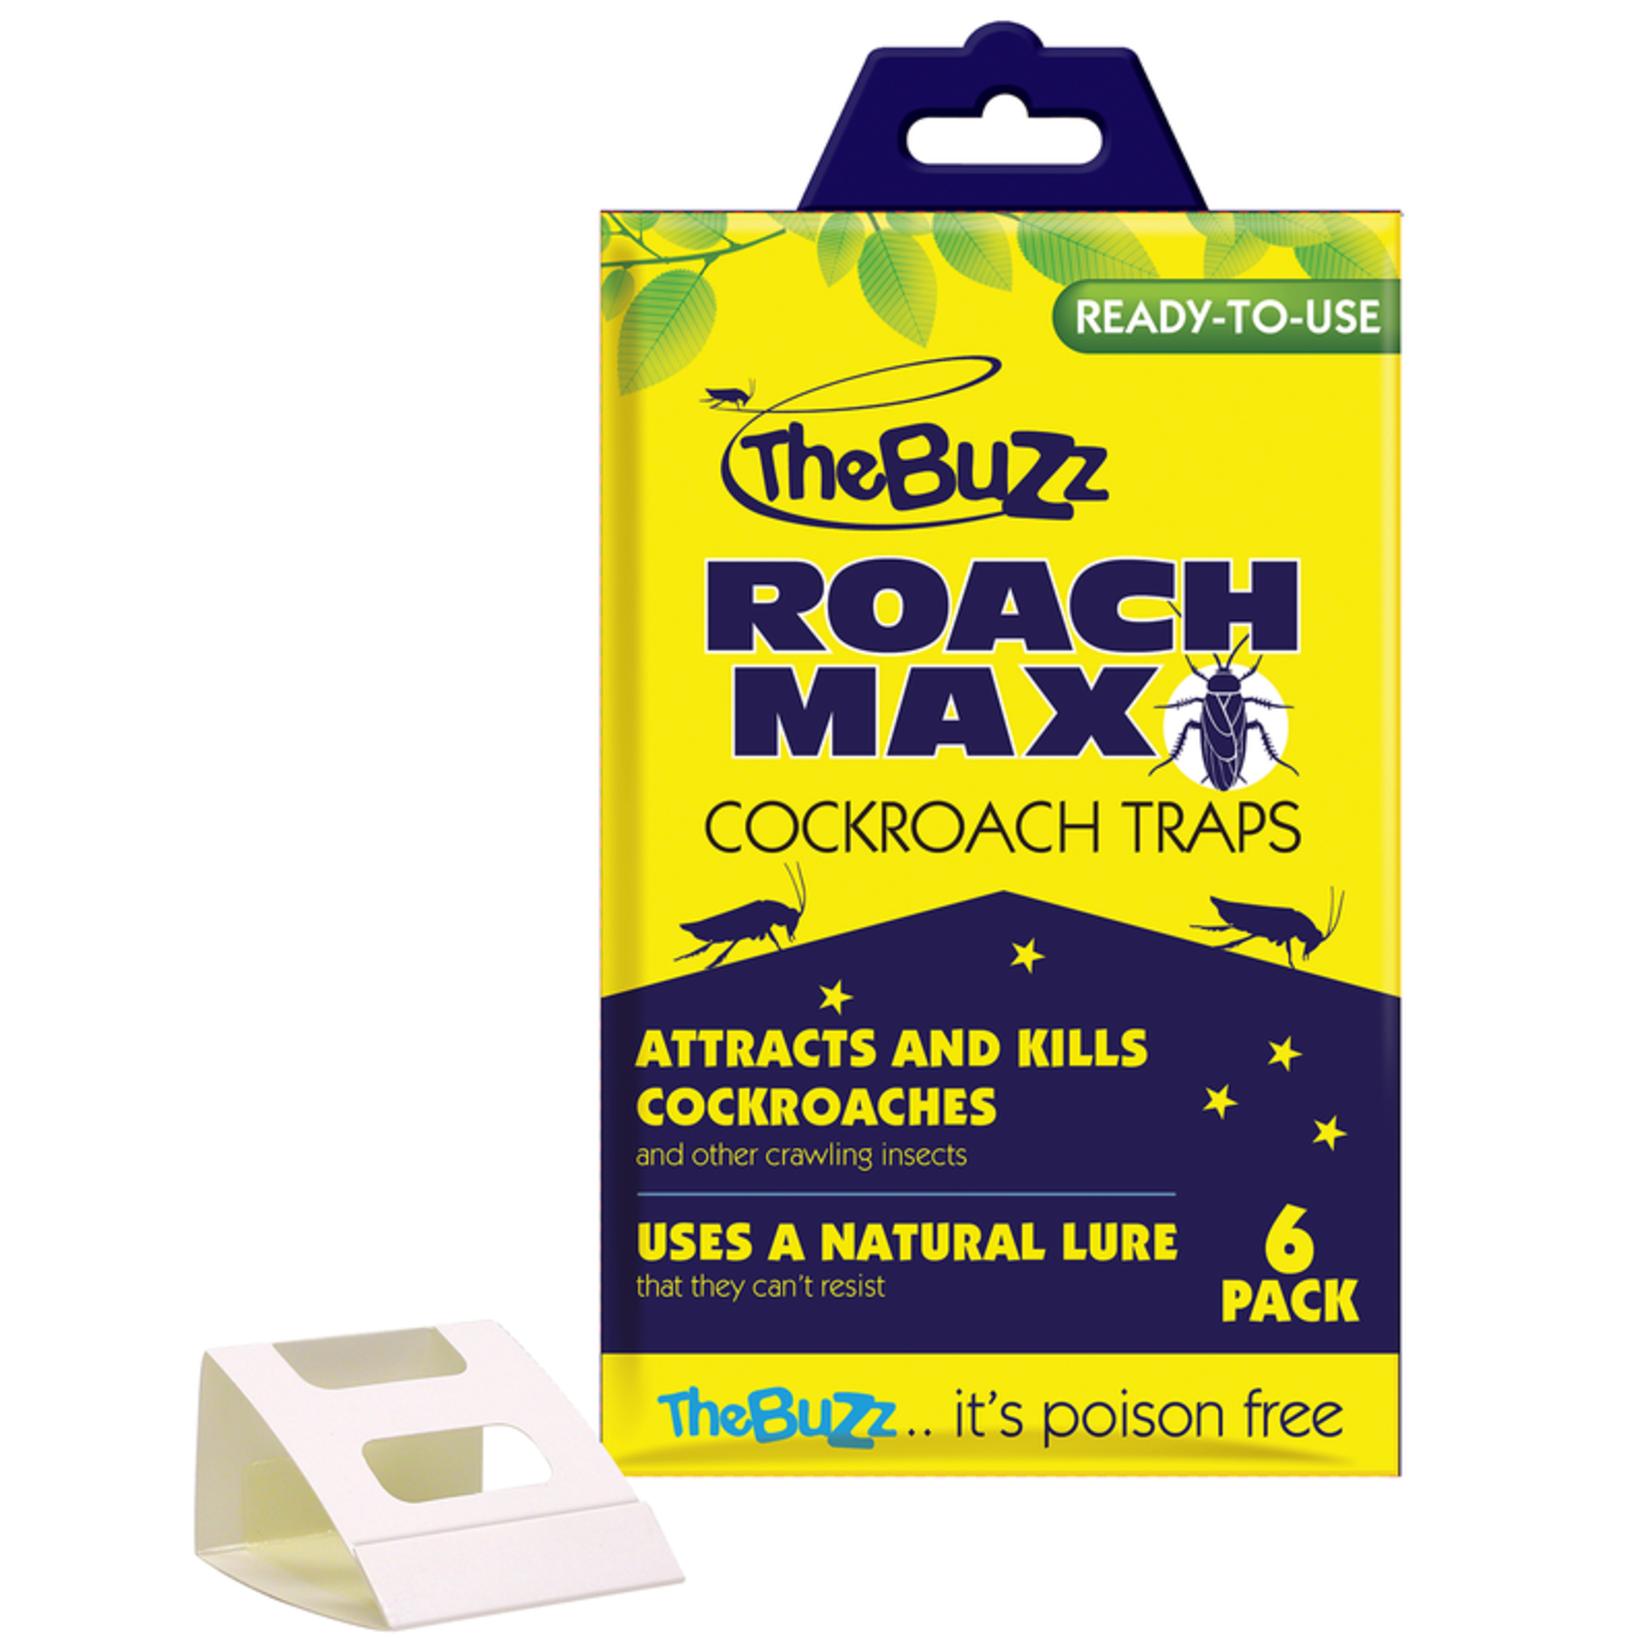 The Buzz The Buzz Cockroach Traps 6pk